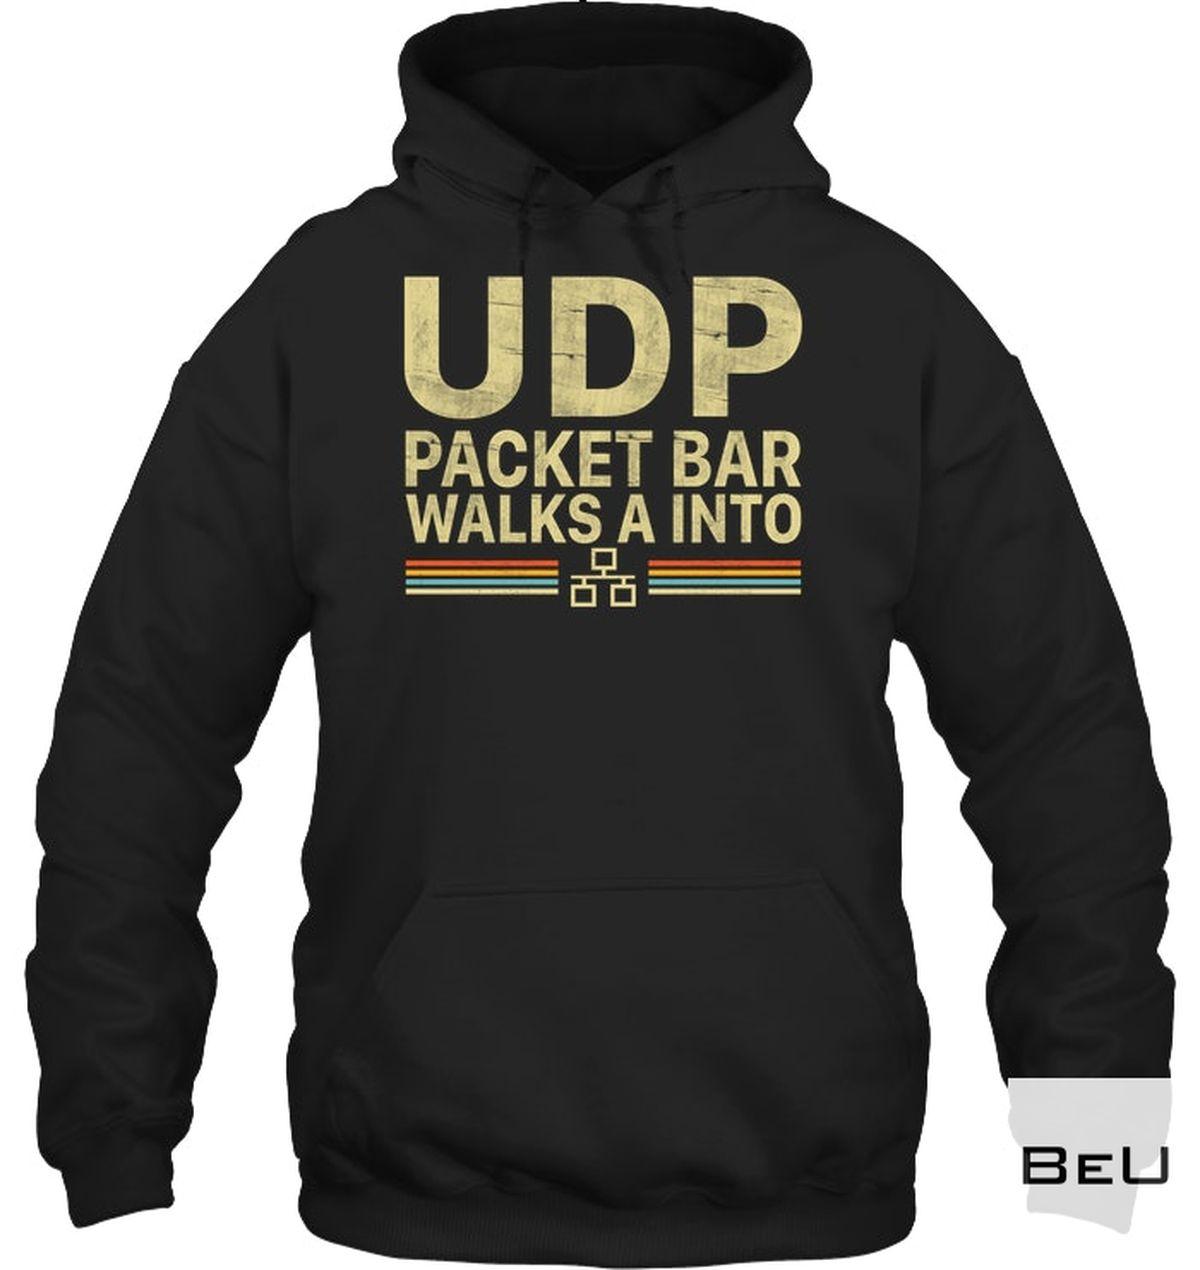 Unique UDP Packet Bar Walk A Into Shirt, hoodie, tank top